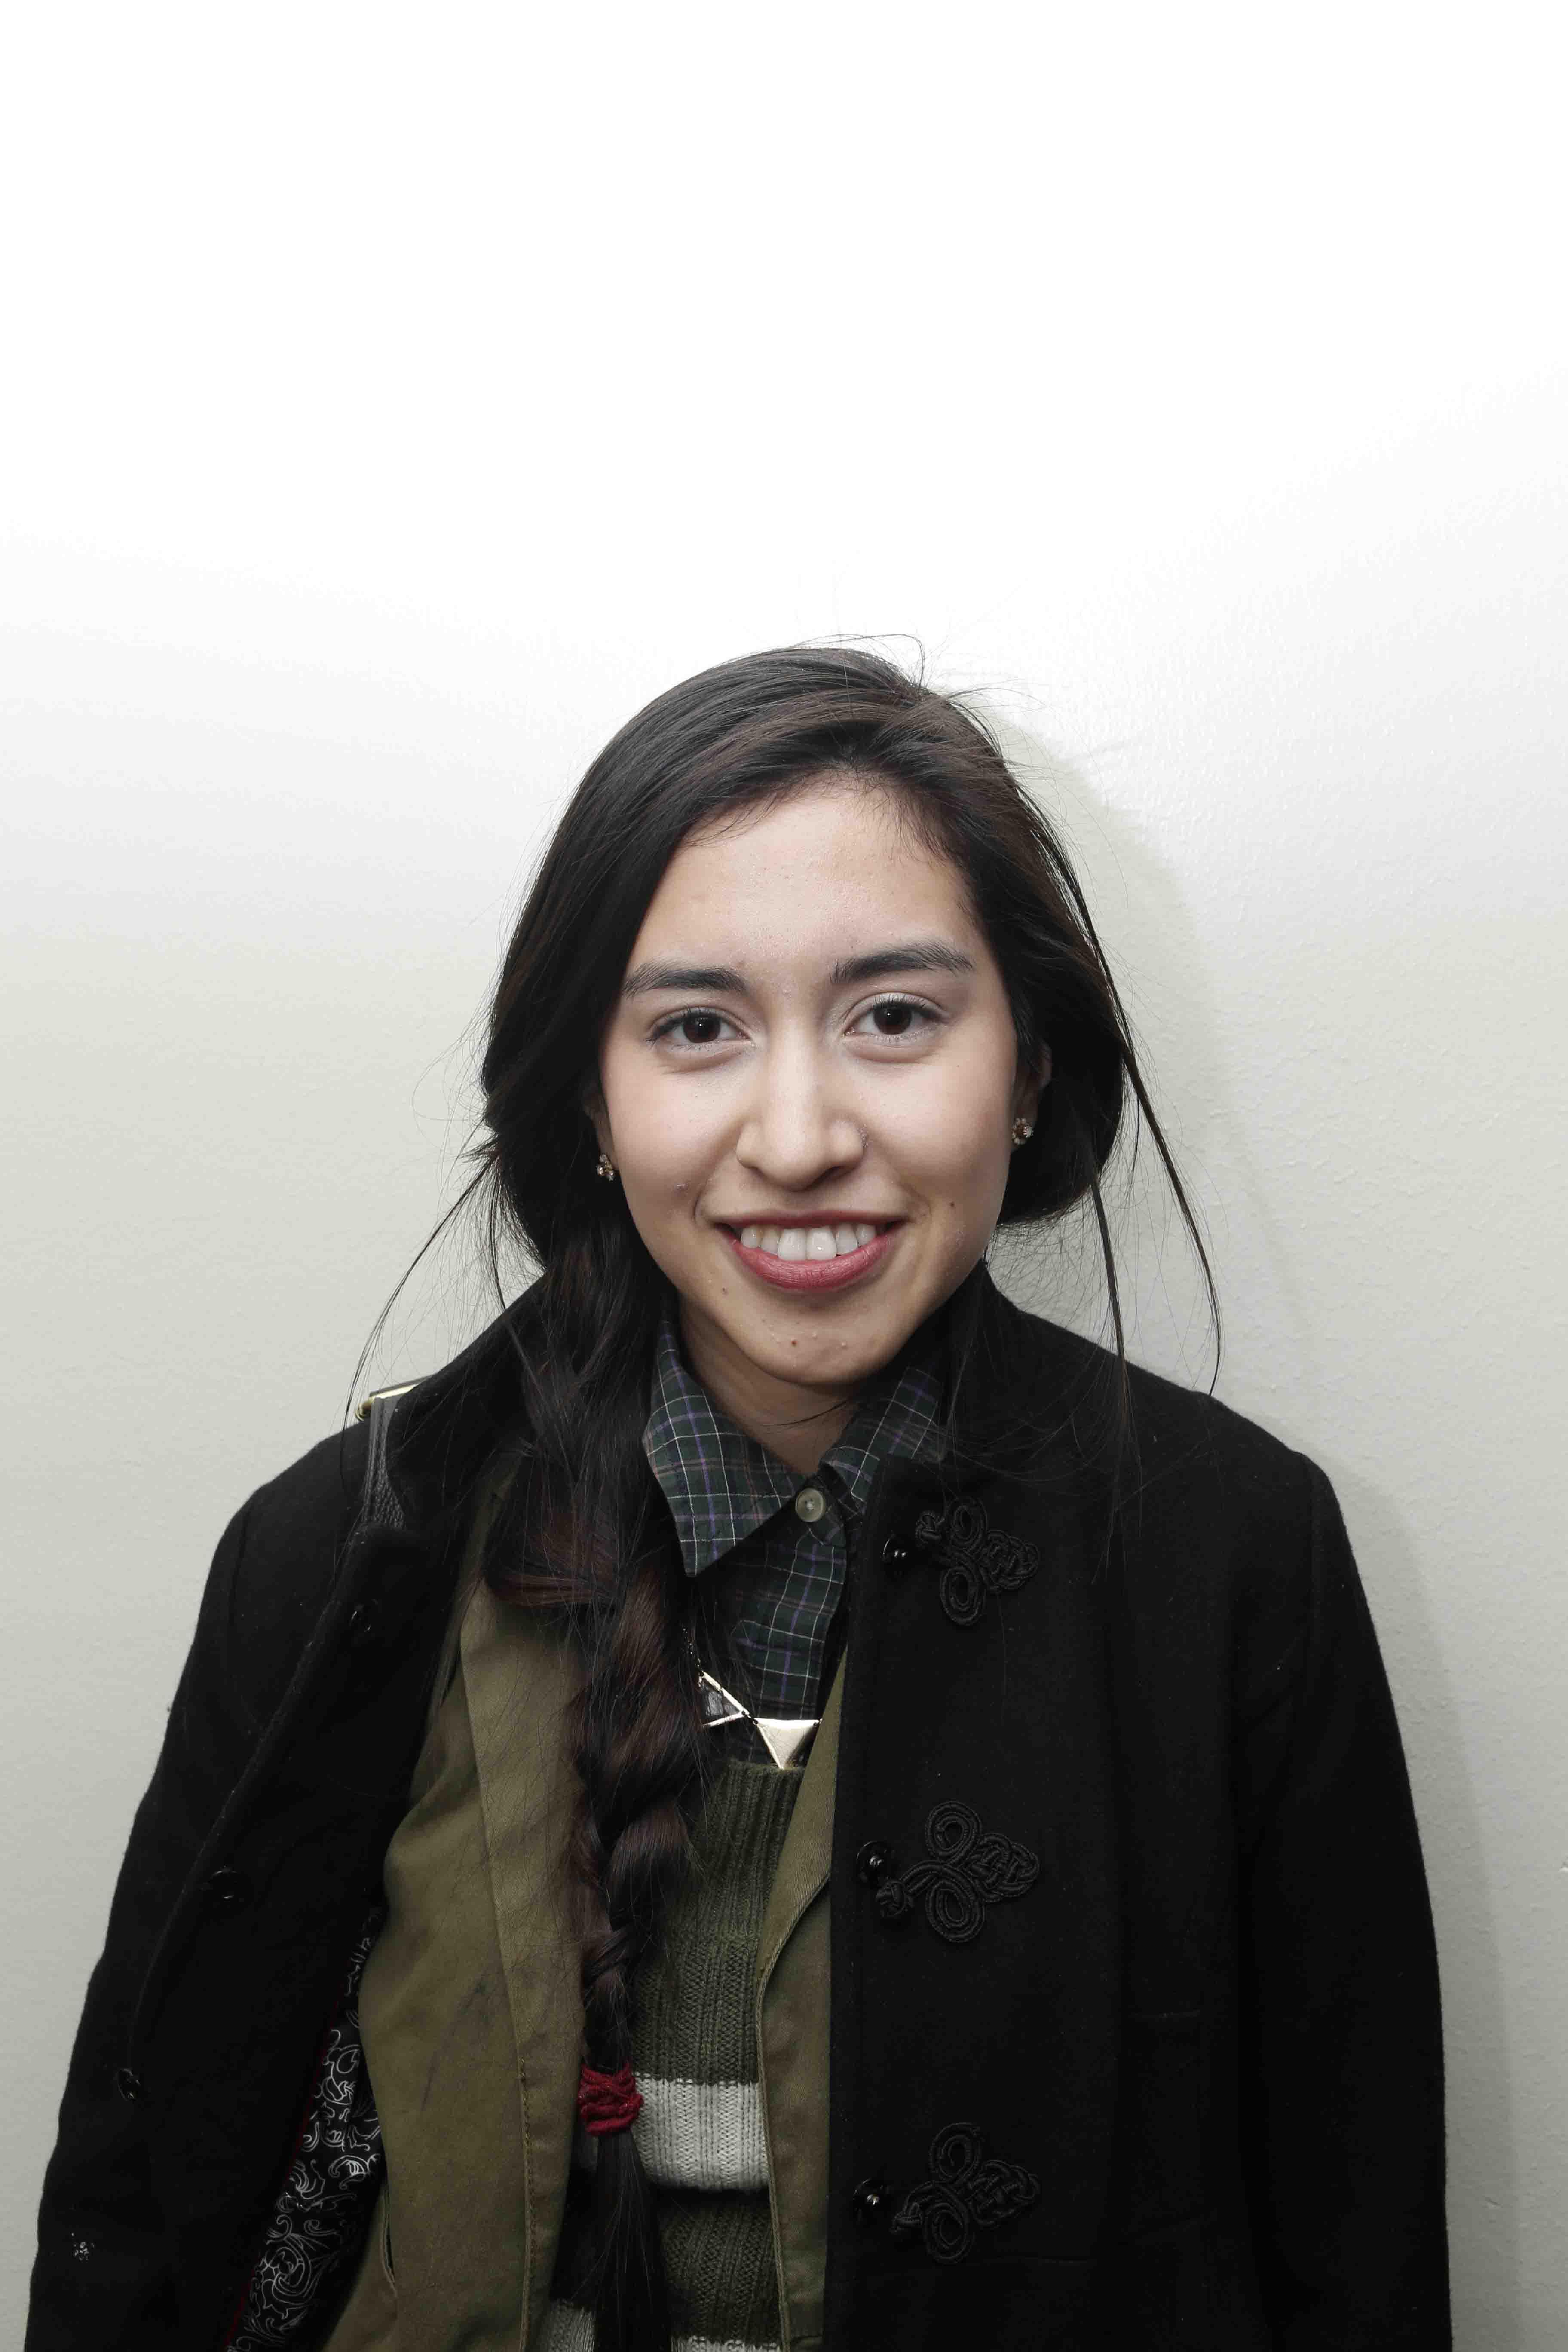 Andrea E. Acosta, entertainment editor